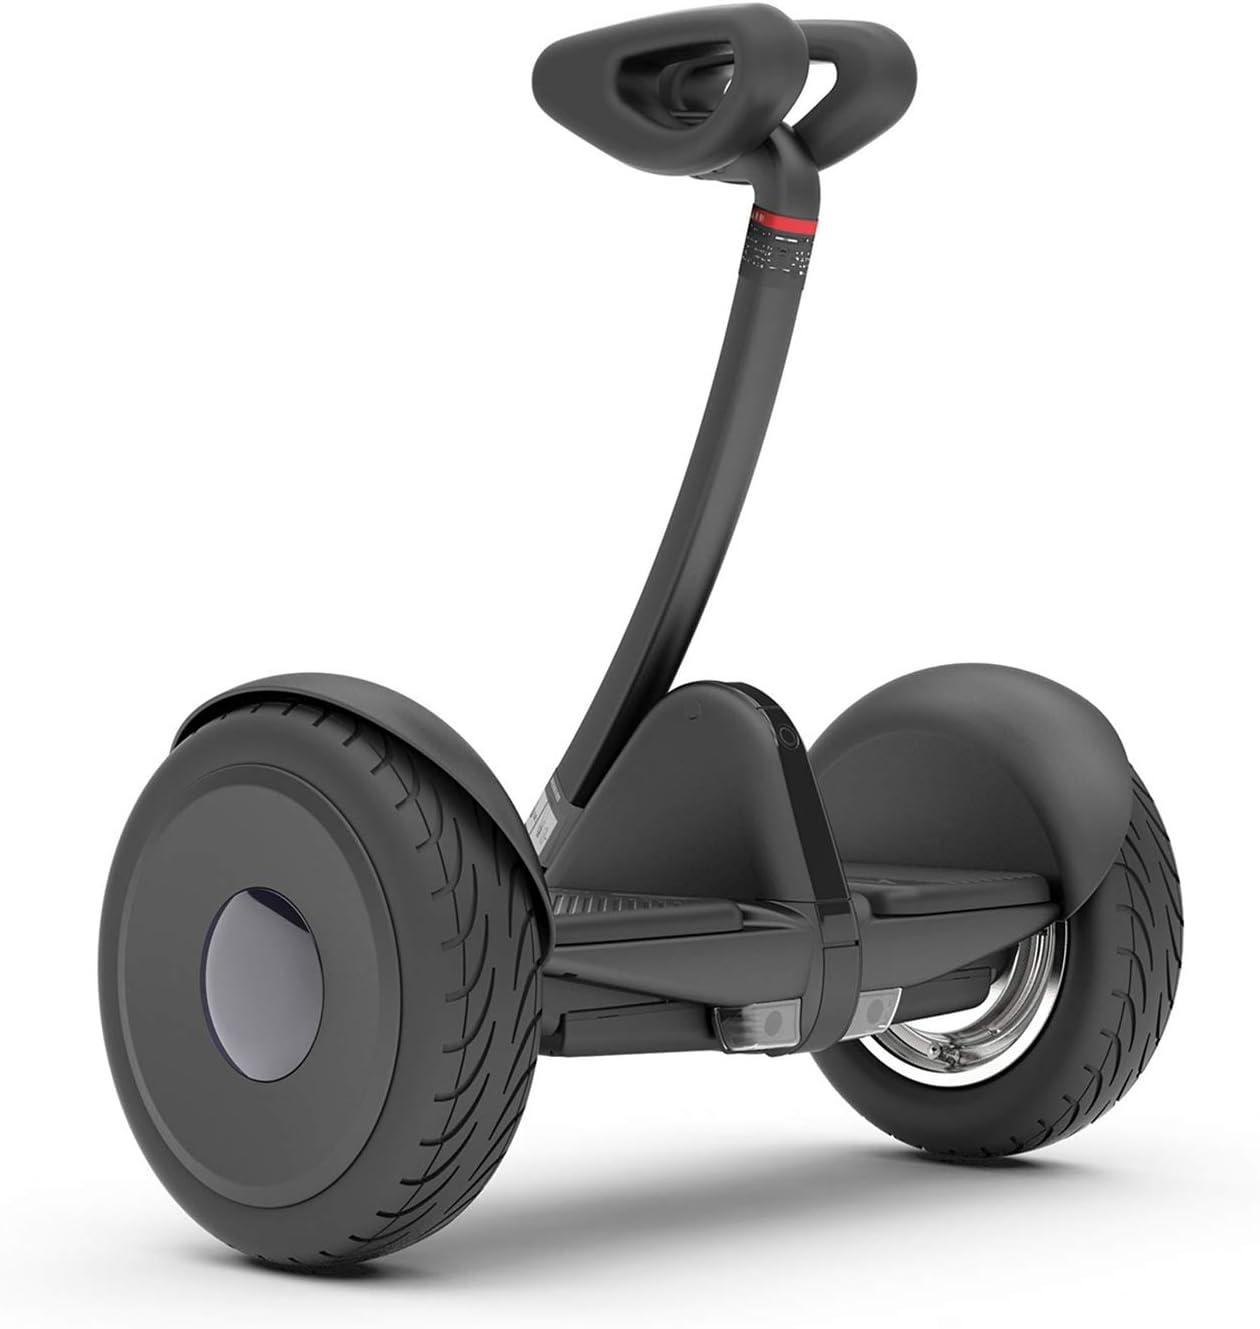 Segway Ninebot S Self-Balancing Electric Scooter